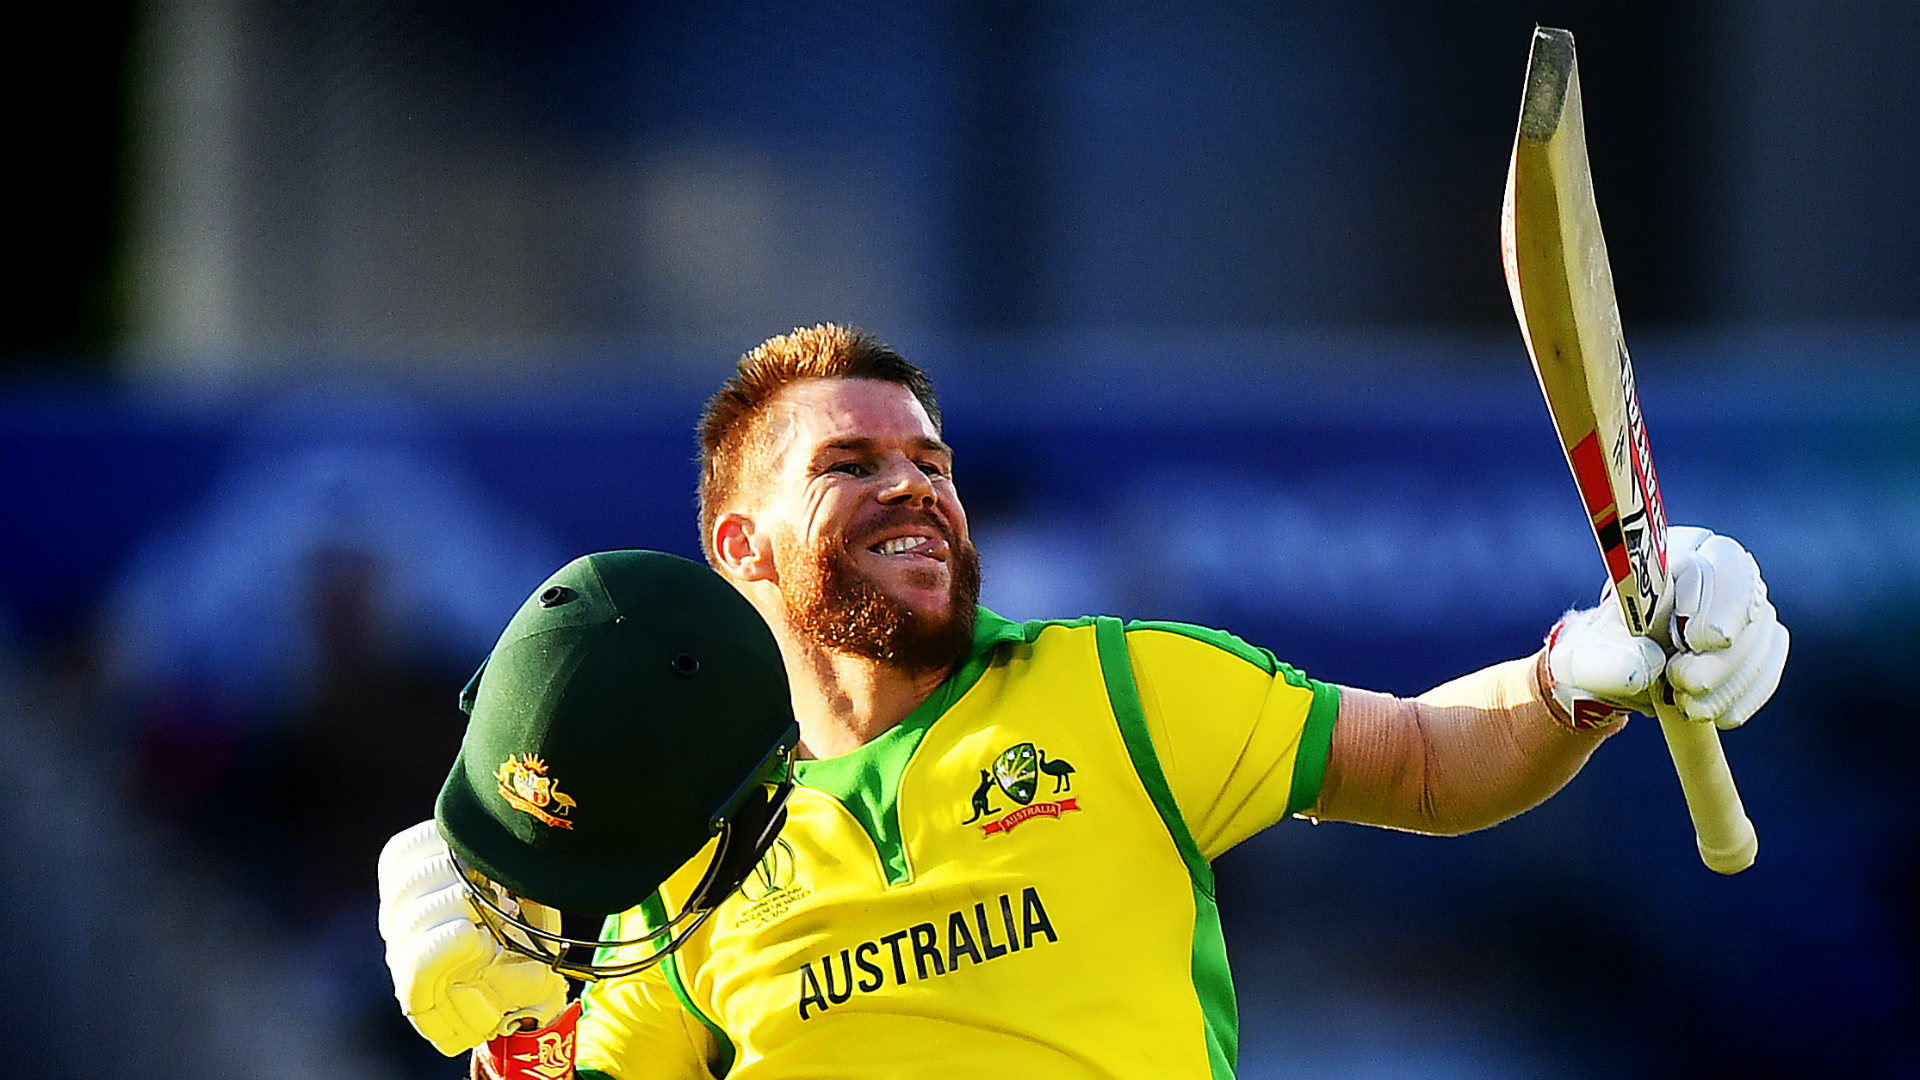 Australia star David Warner savoured his unbeaten 128-run performance in Tuesday's 10-wicket demolition of India.